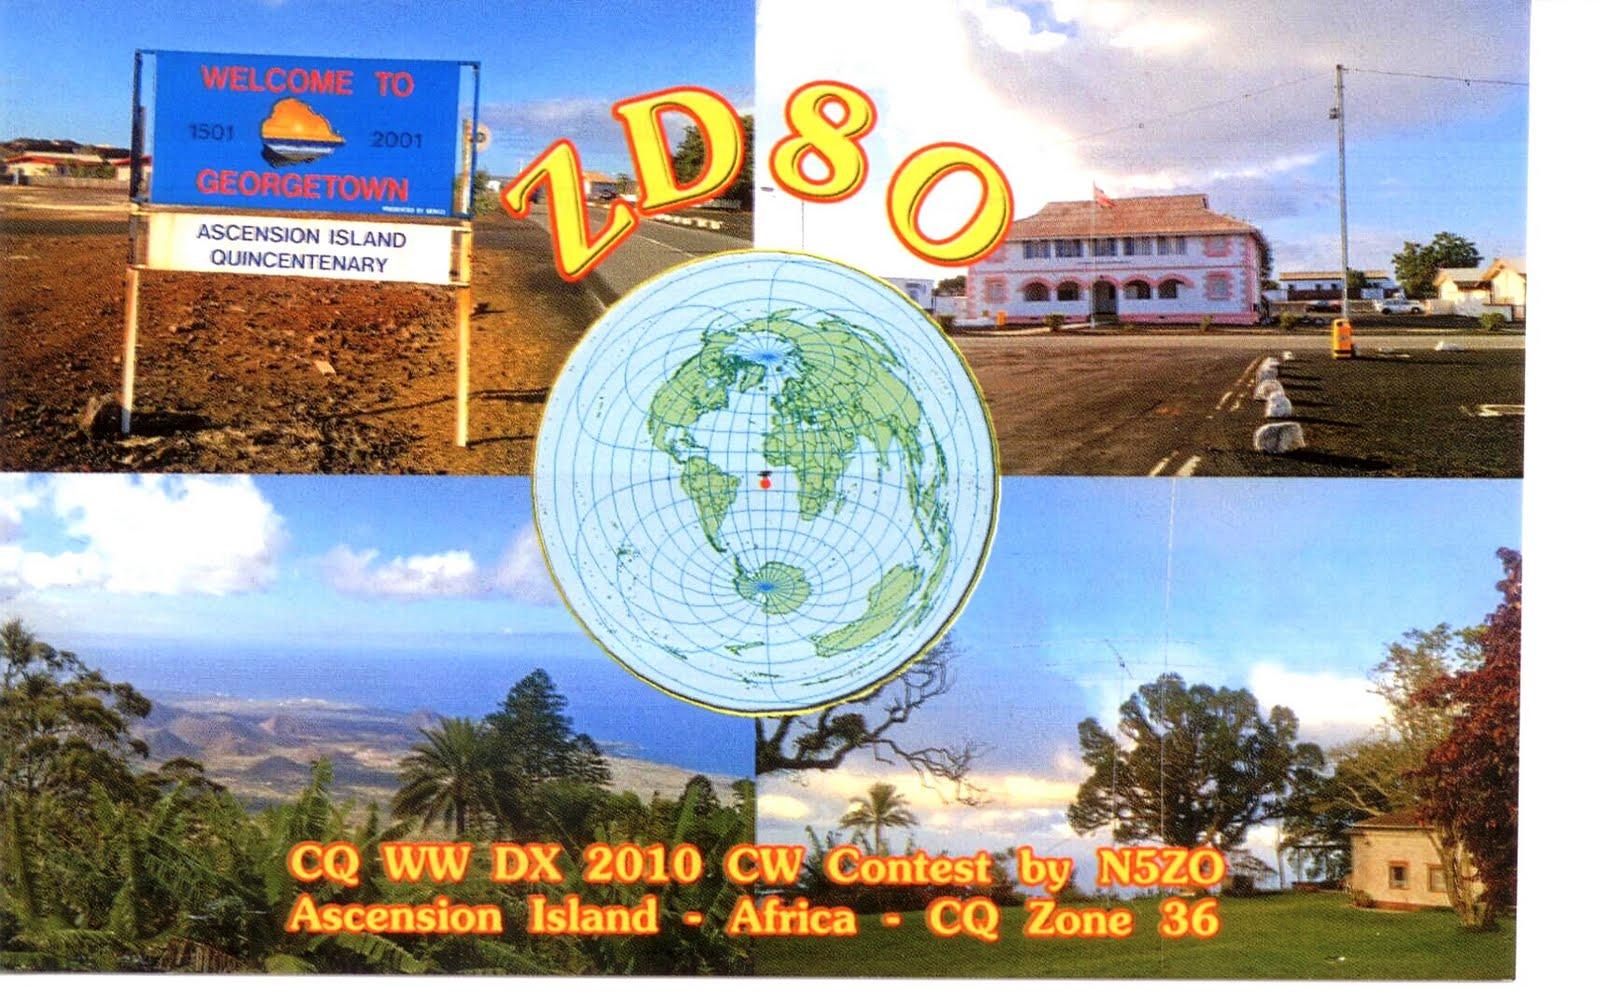 Ascension Island ZD8O QSL